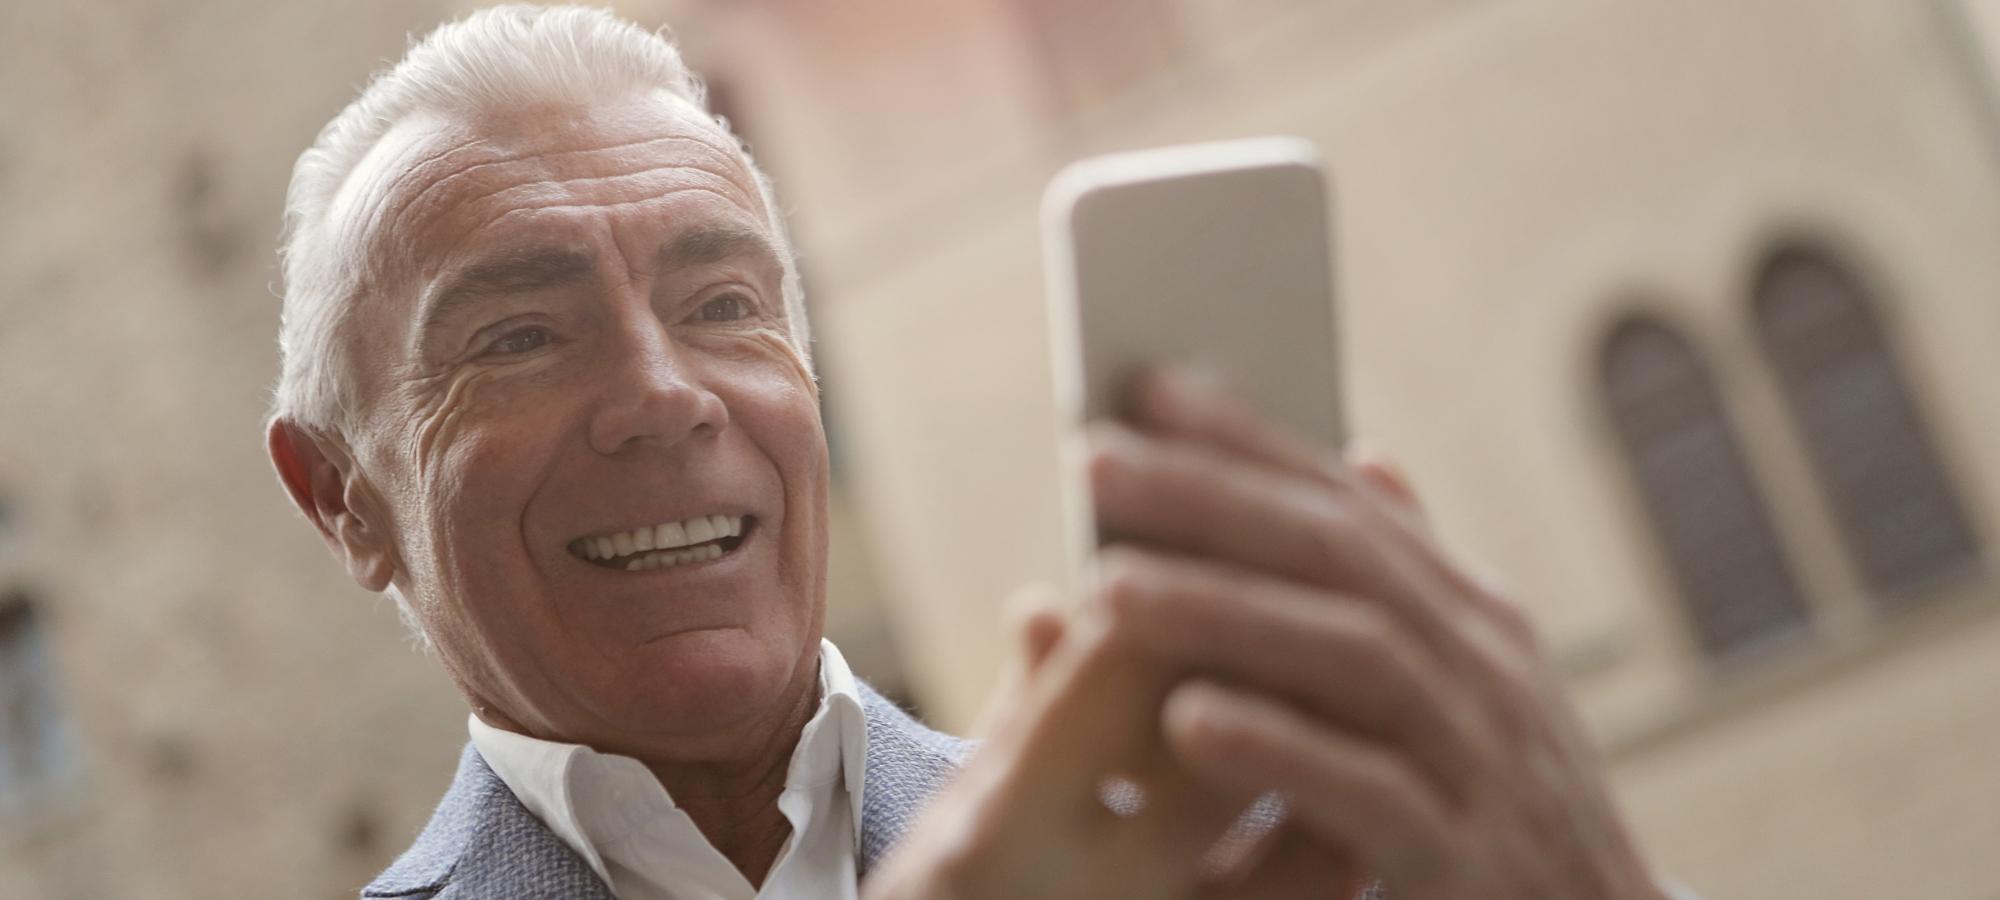 elderly man reading information on cell phone